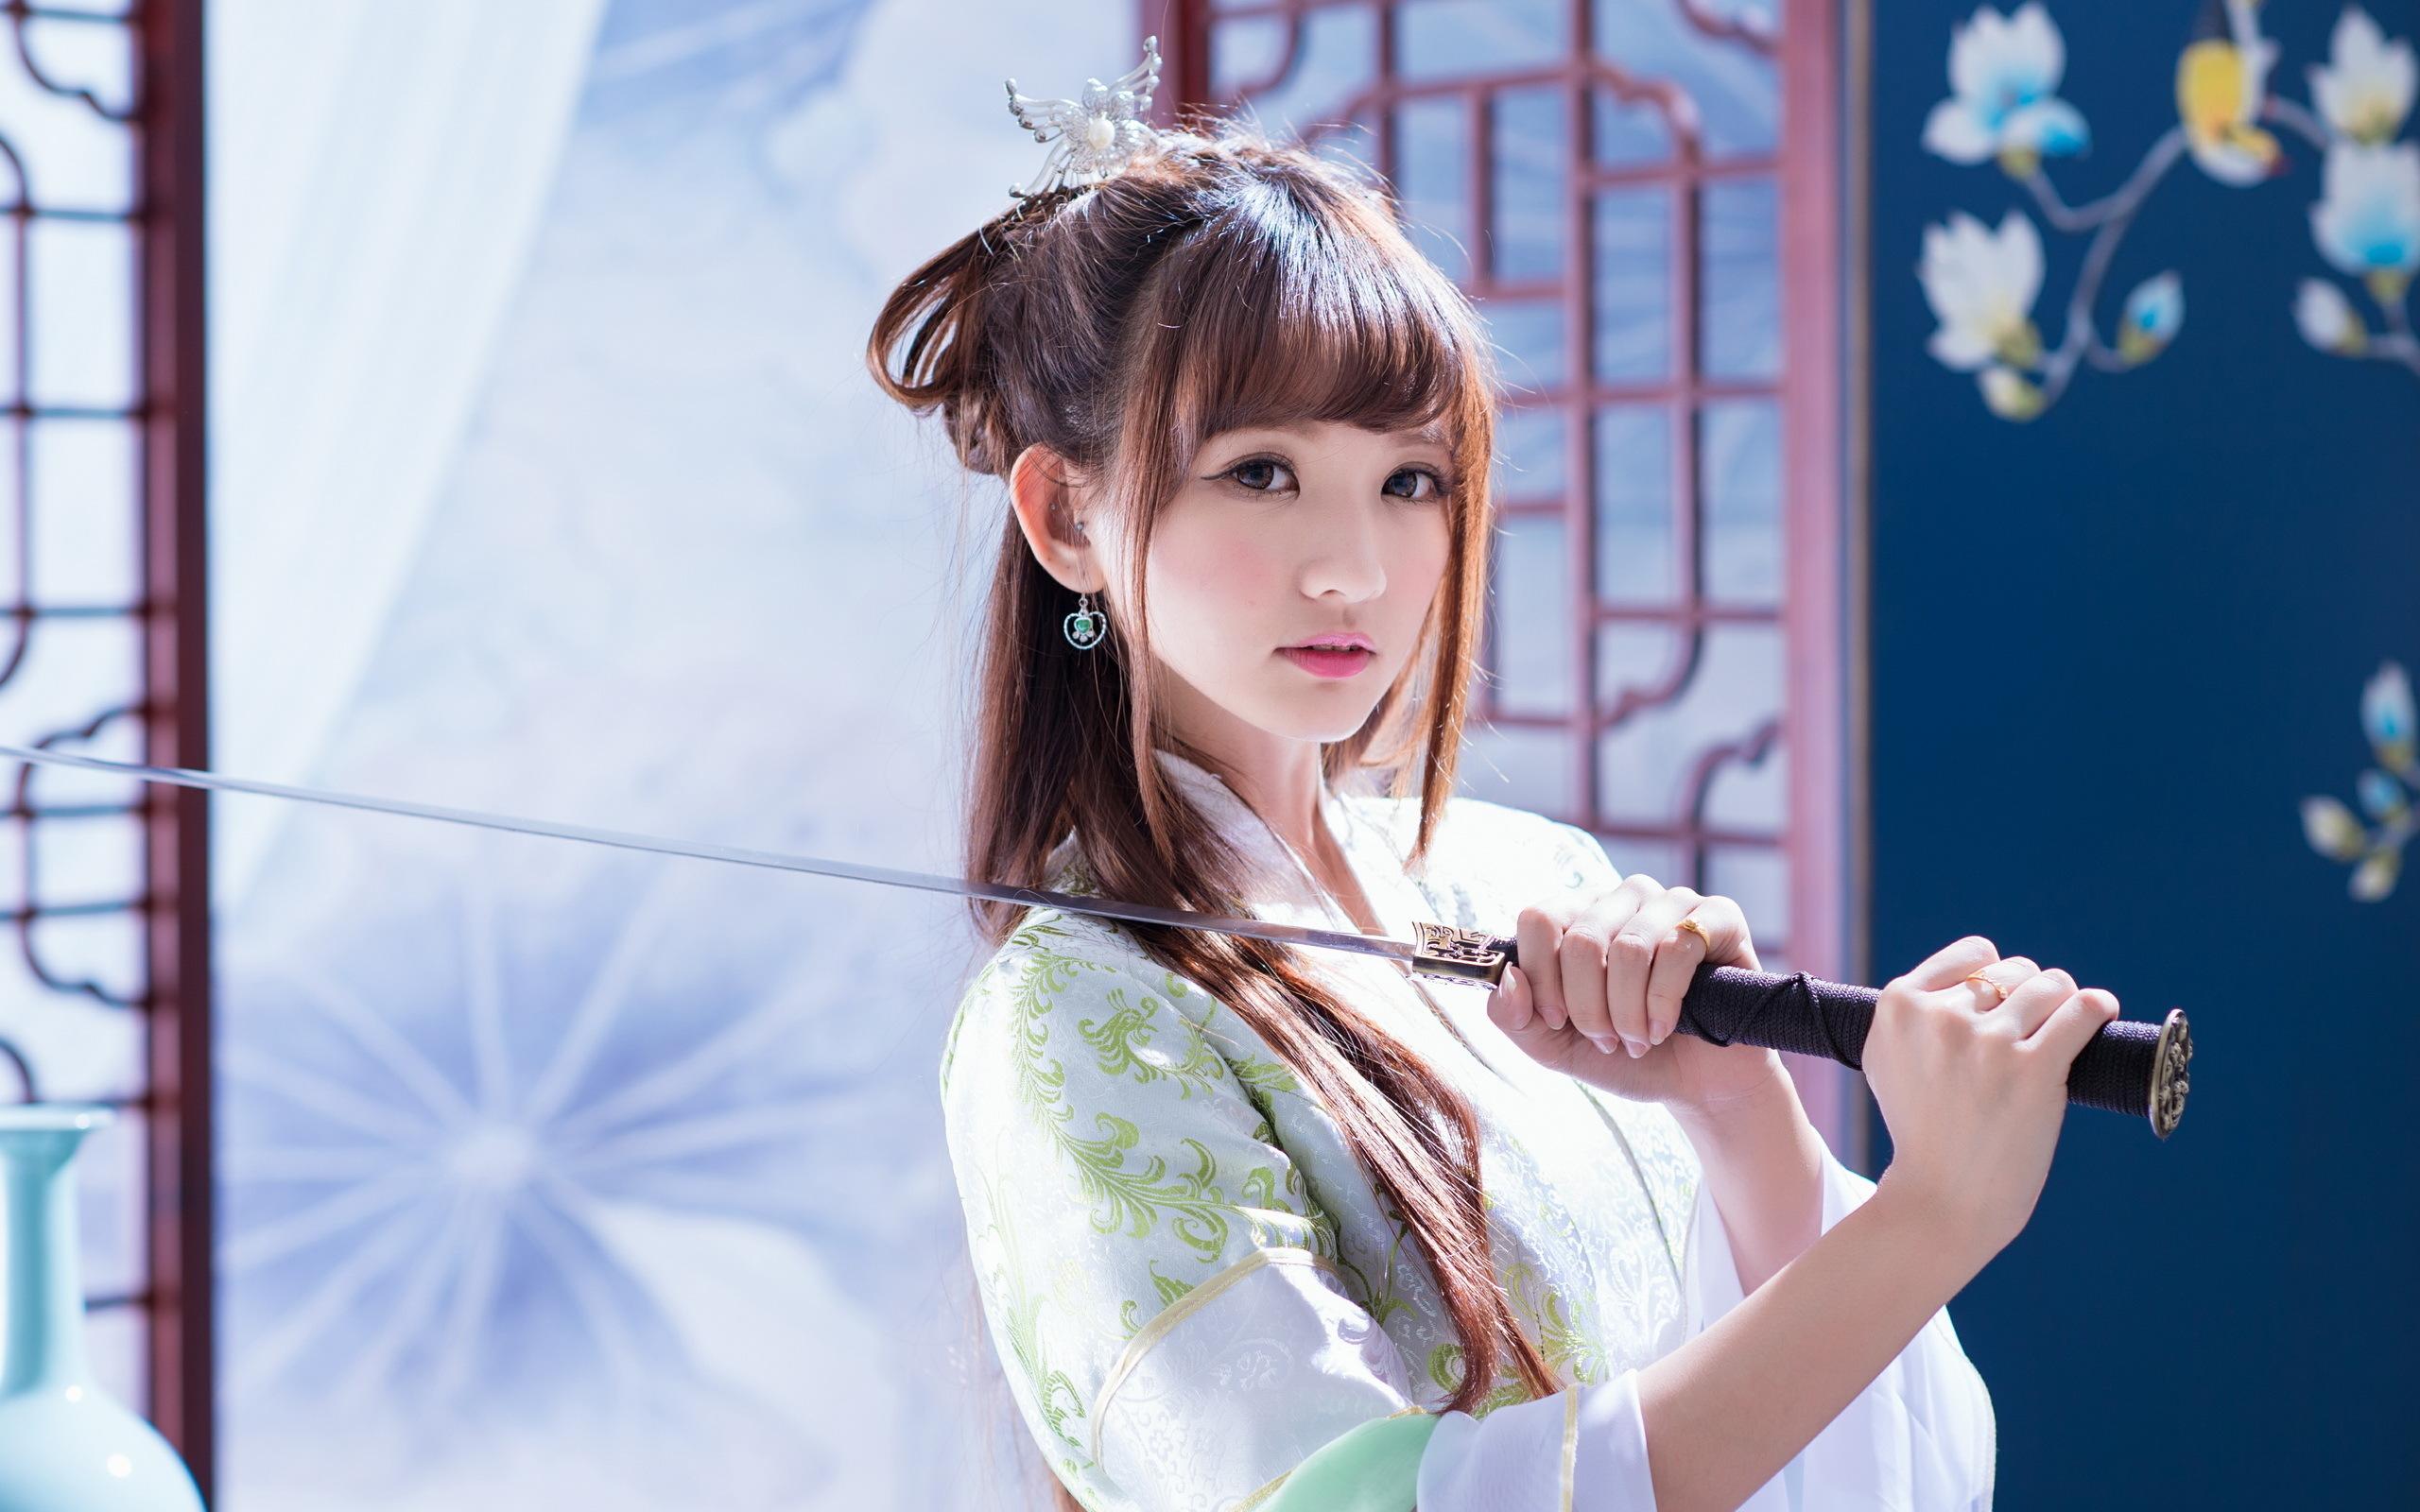 Geisha girl wallpaper wall wallpapersafari - Girl with sword wallpaper ...